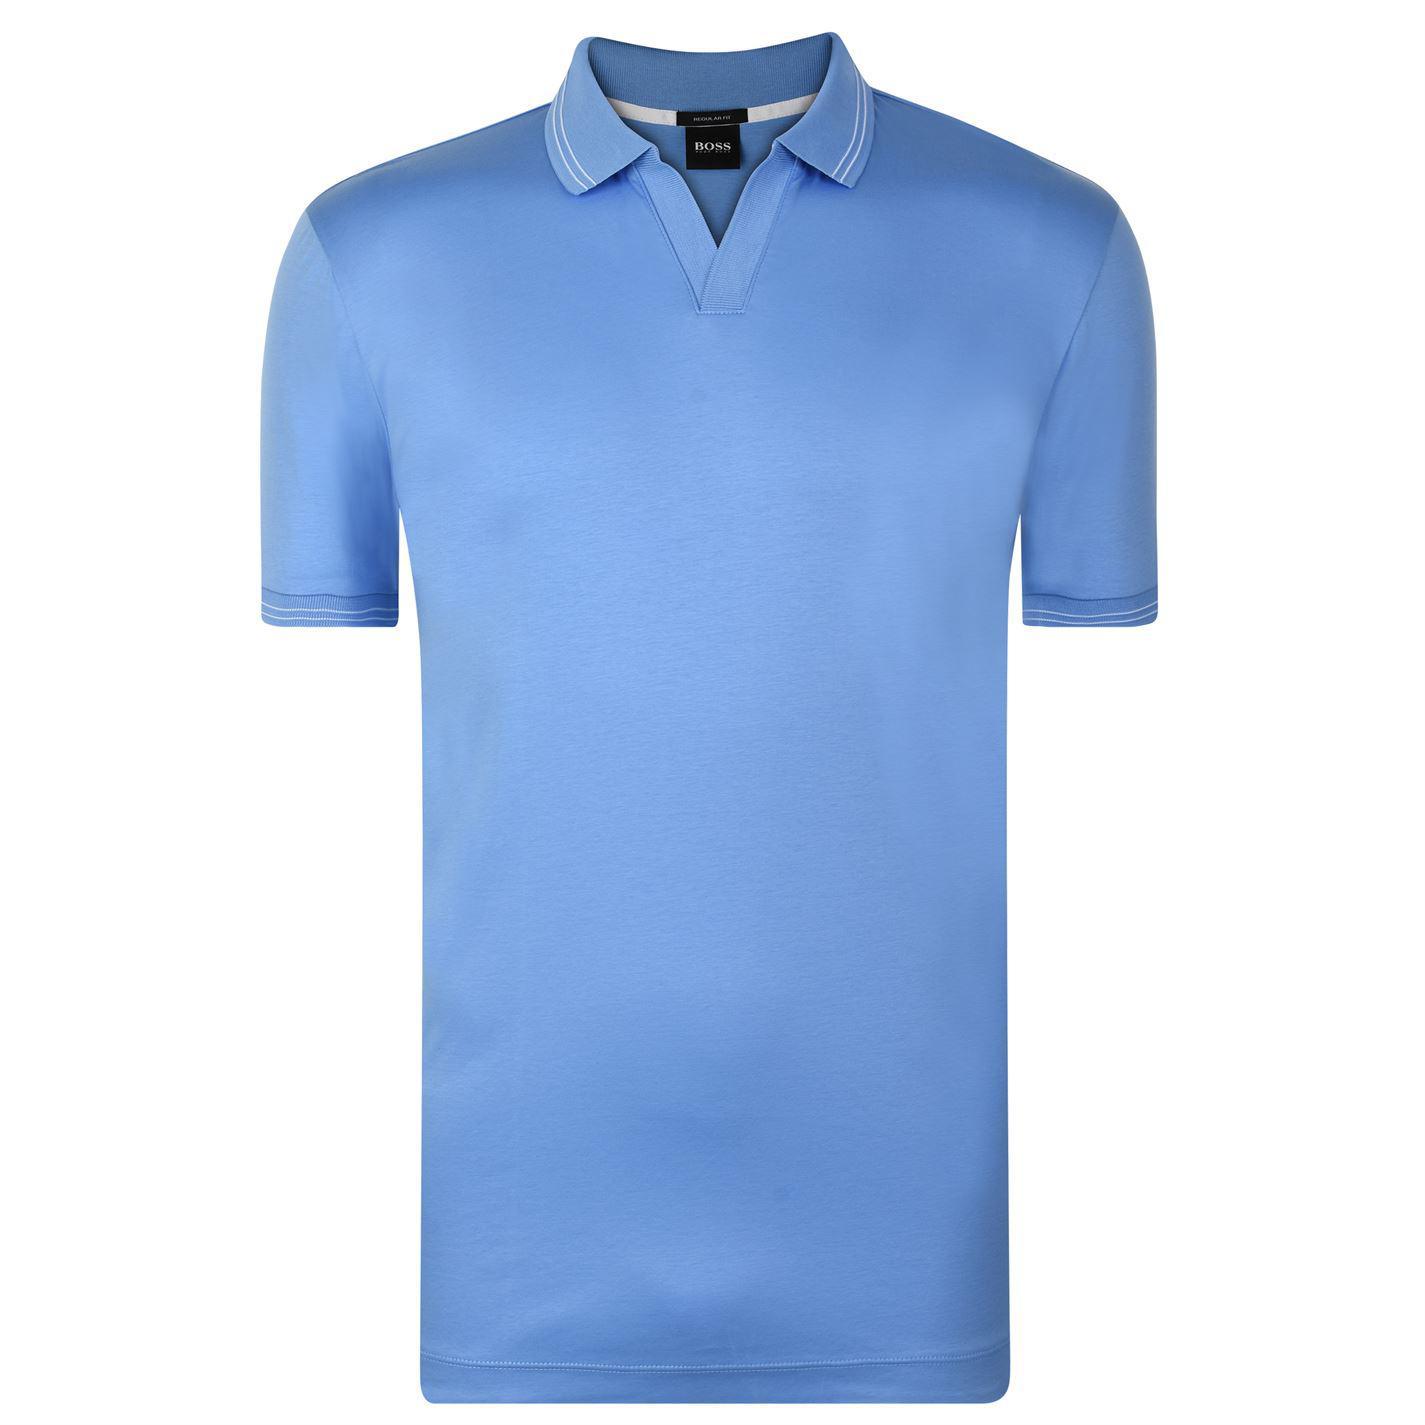 374e30a9b BOSS Parley Skip Polo Shirt in Blue for Men - Lyst